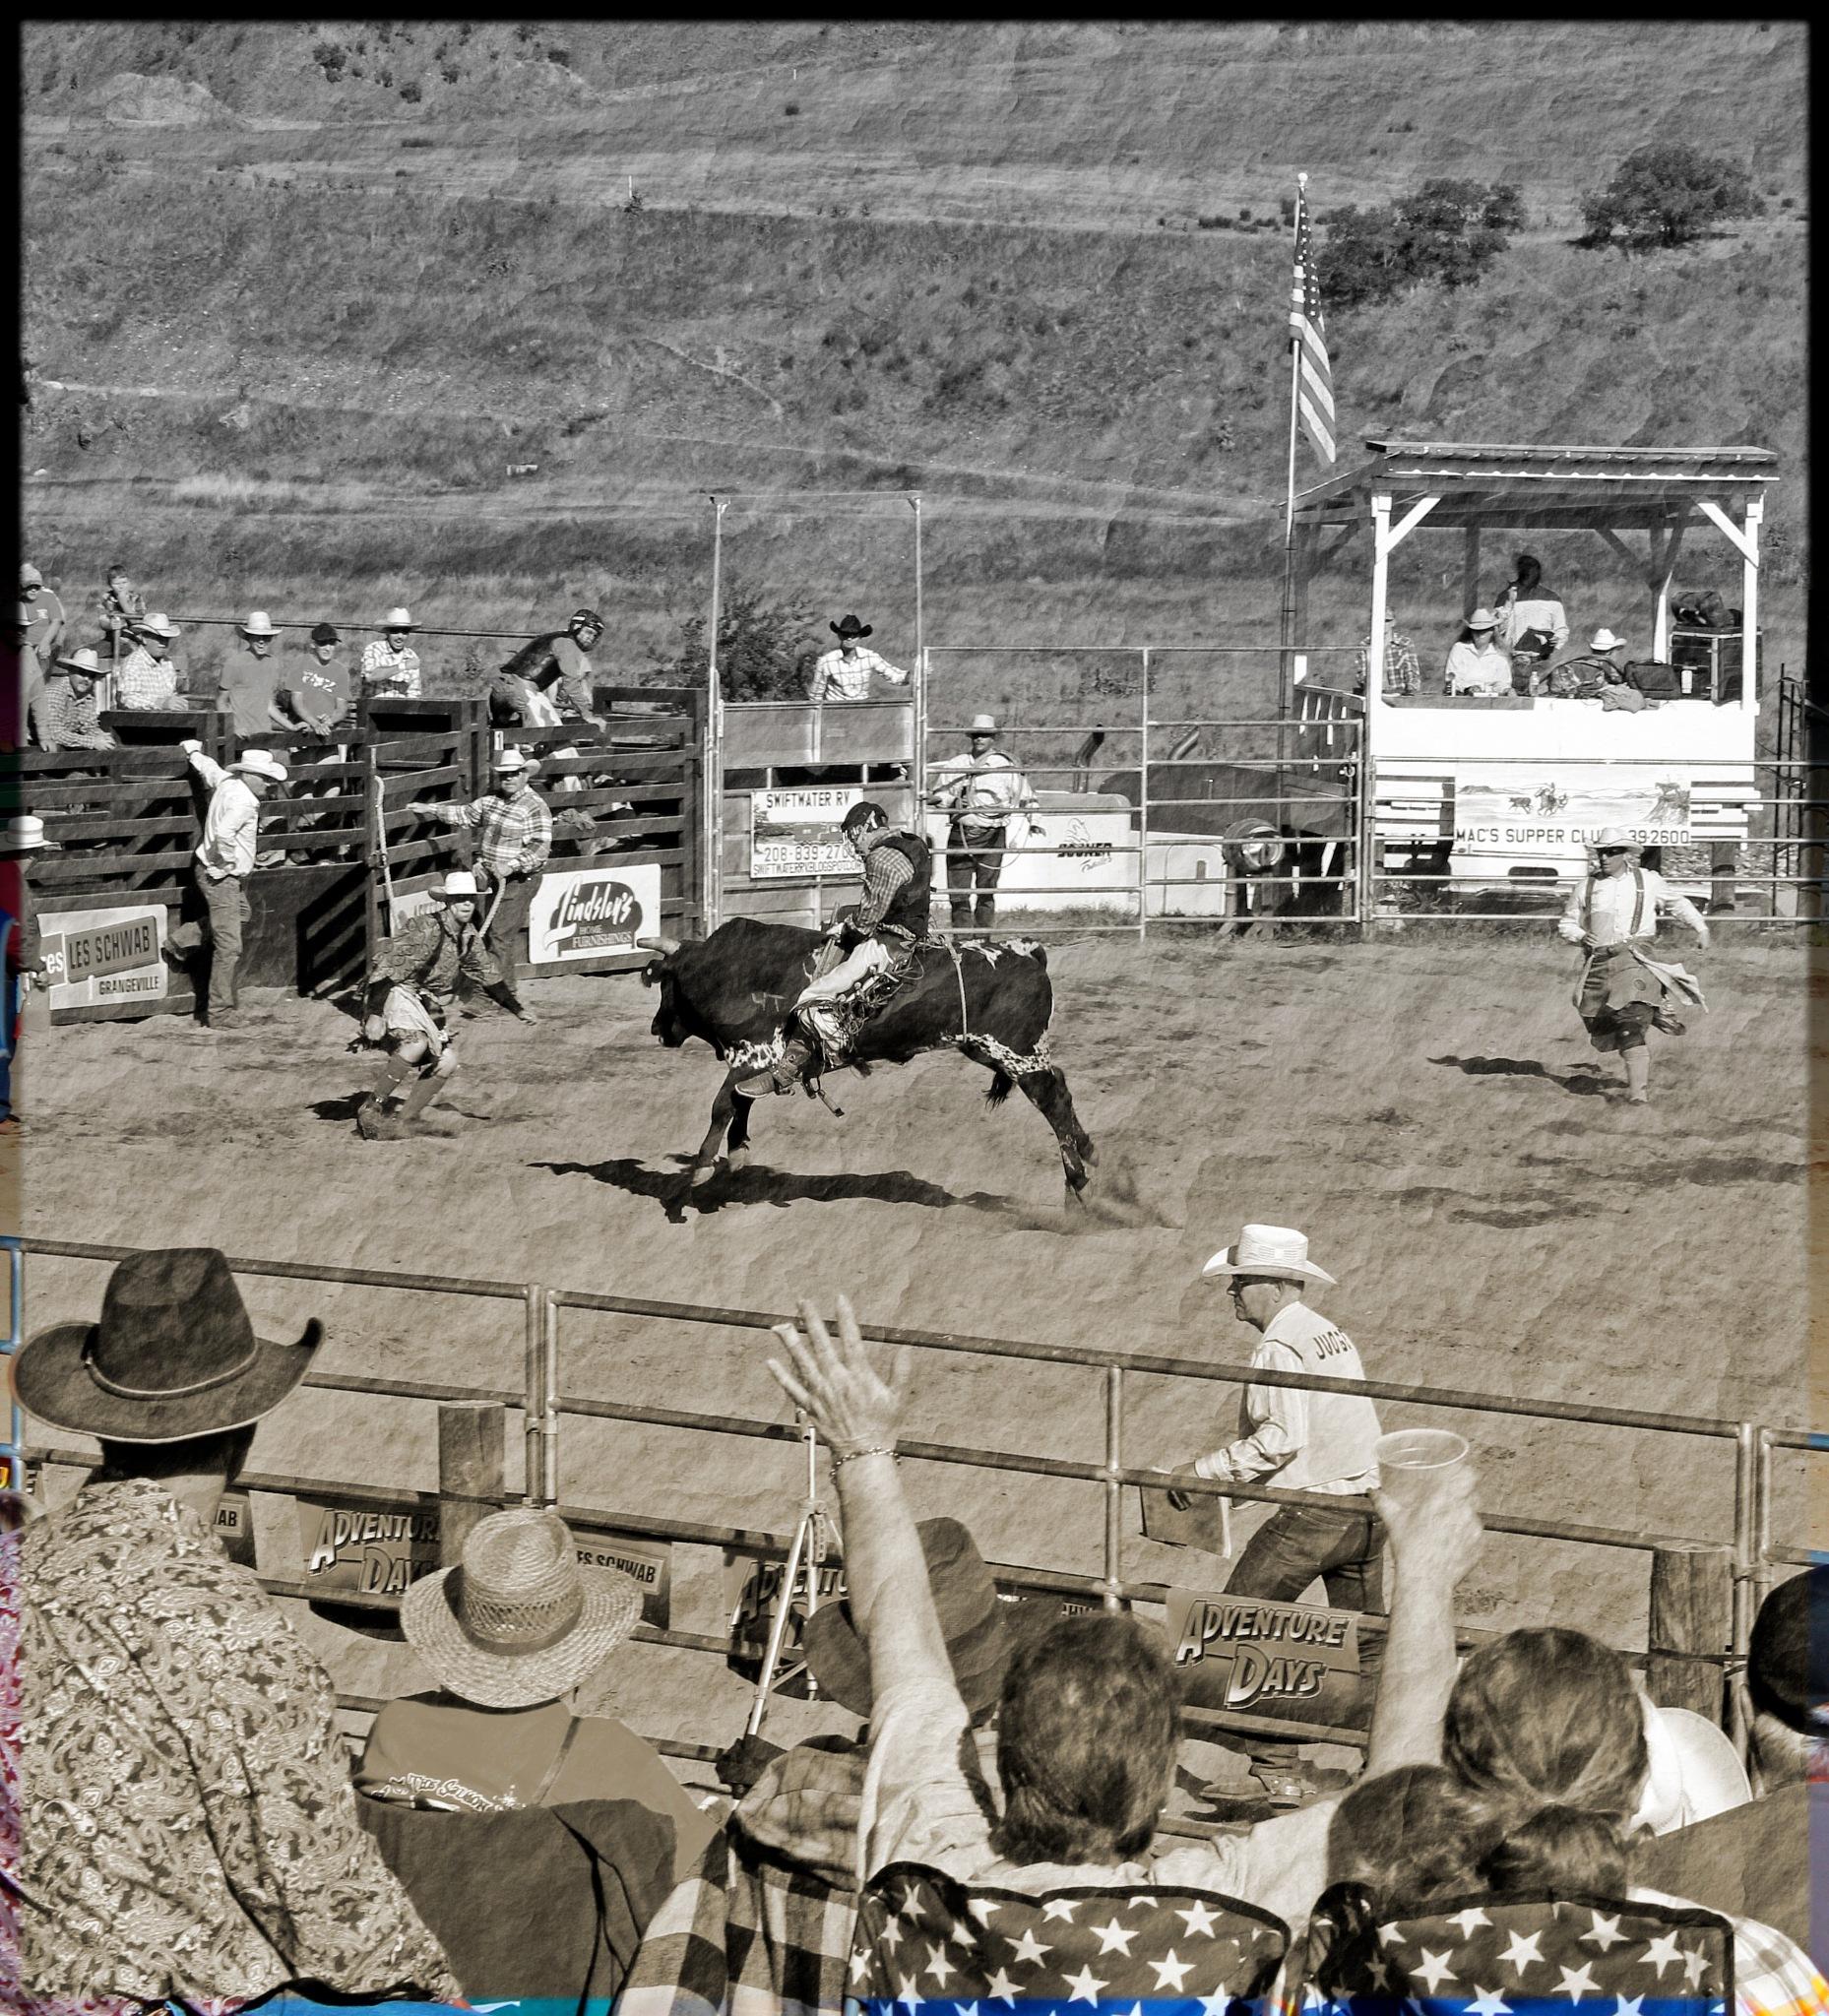 Wild west hero by Nick Birch